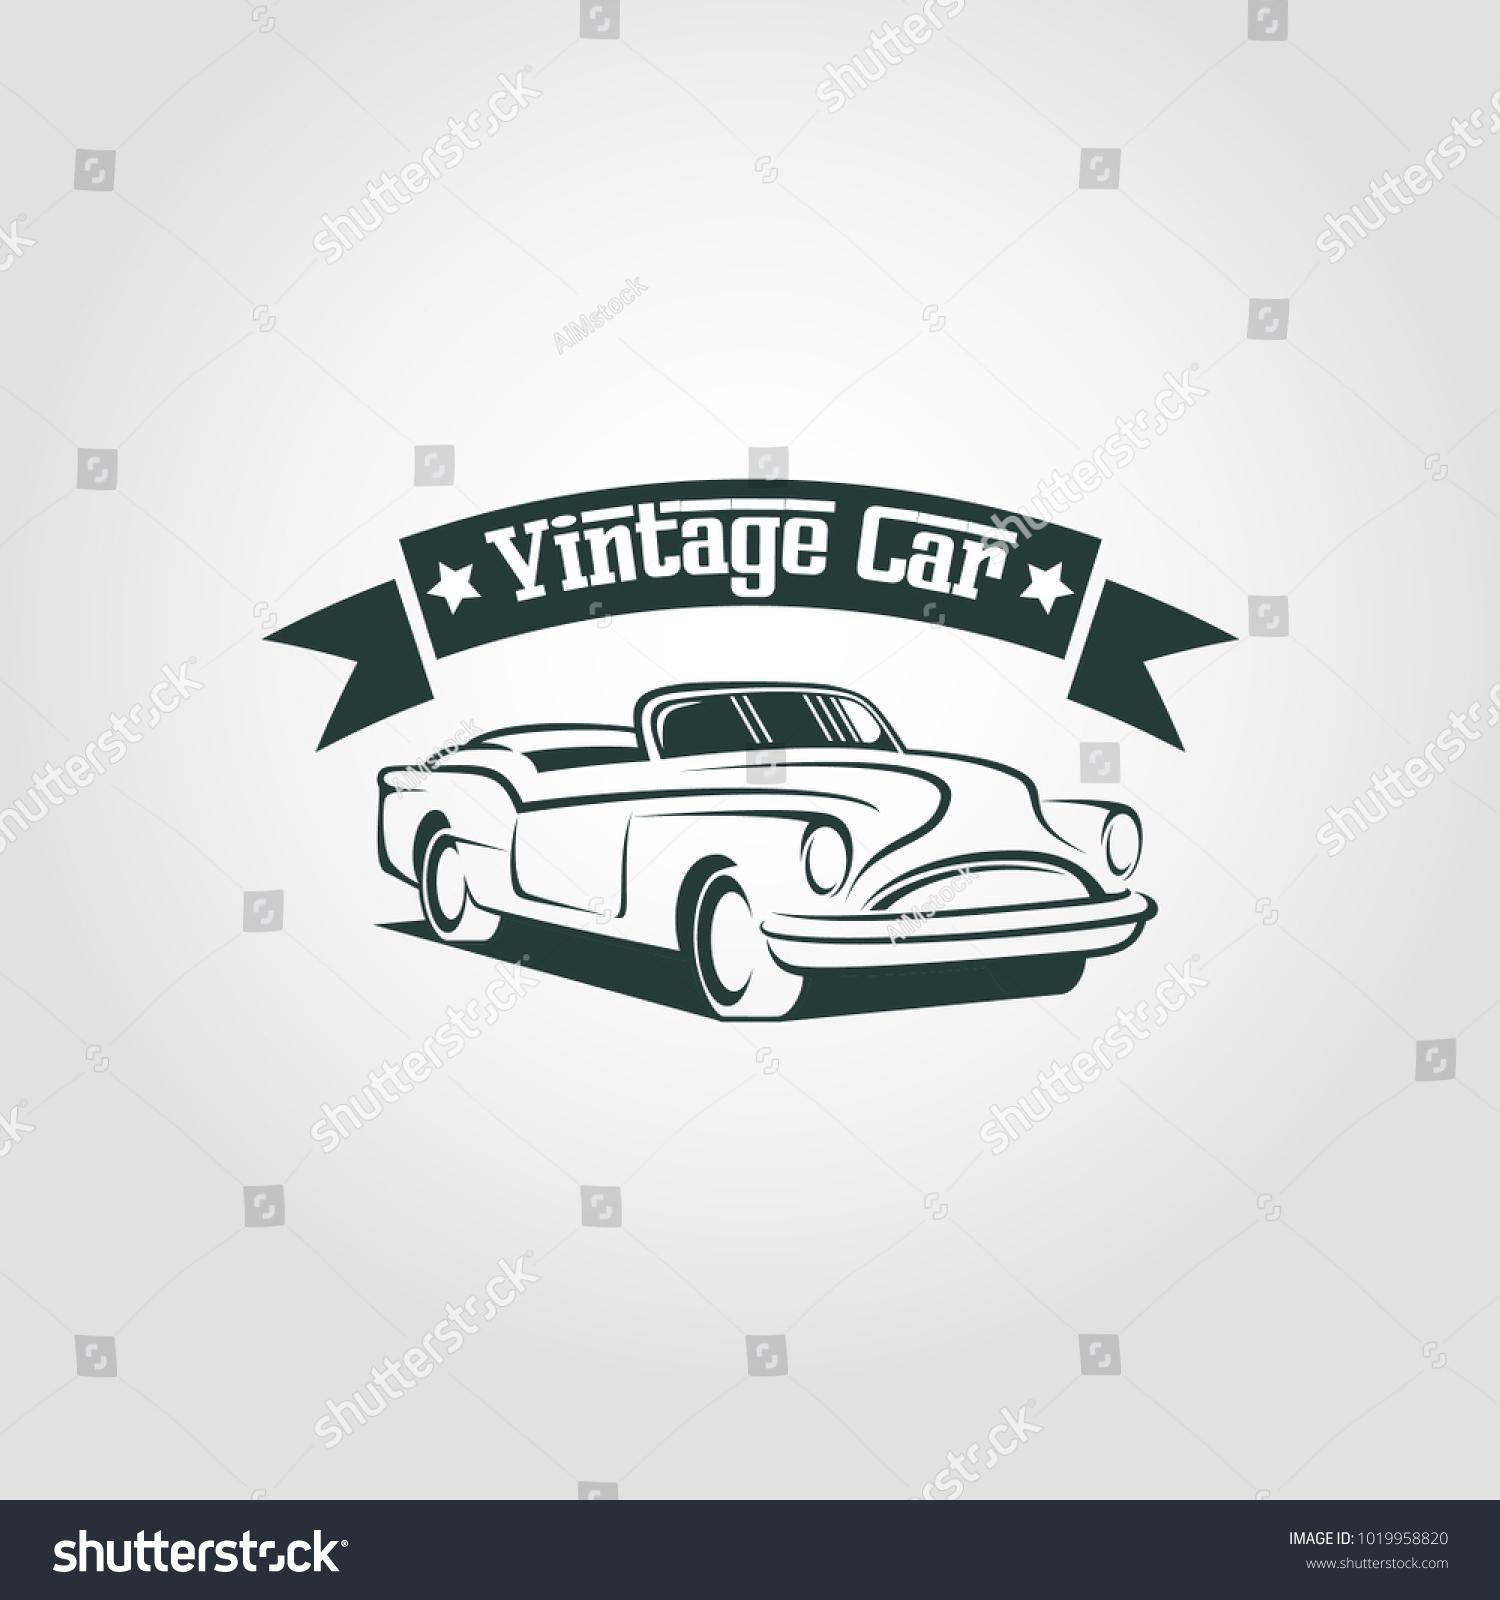 Vintage Car Logo Vector Stock Vector 1019958820 - Shutterstock